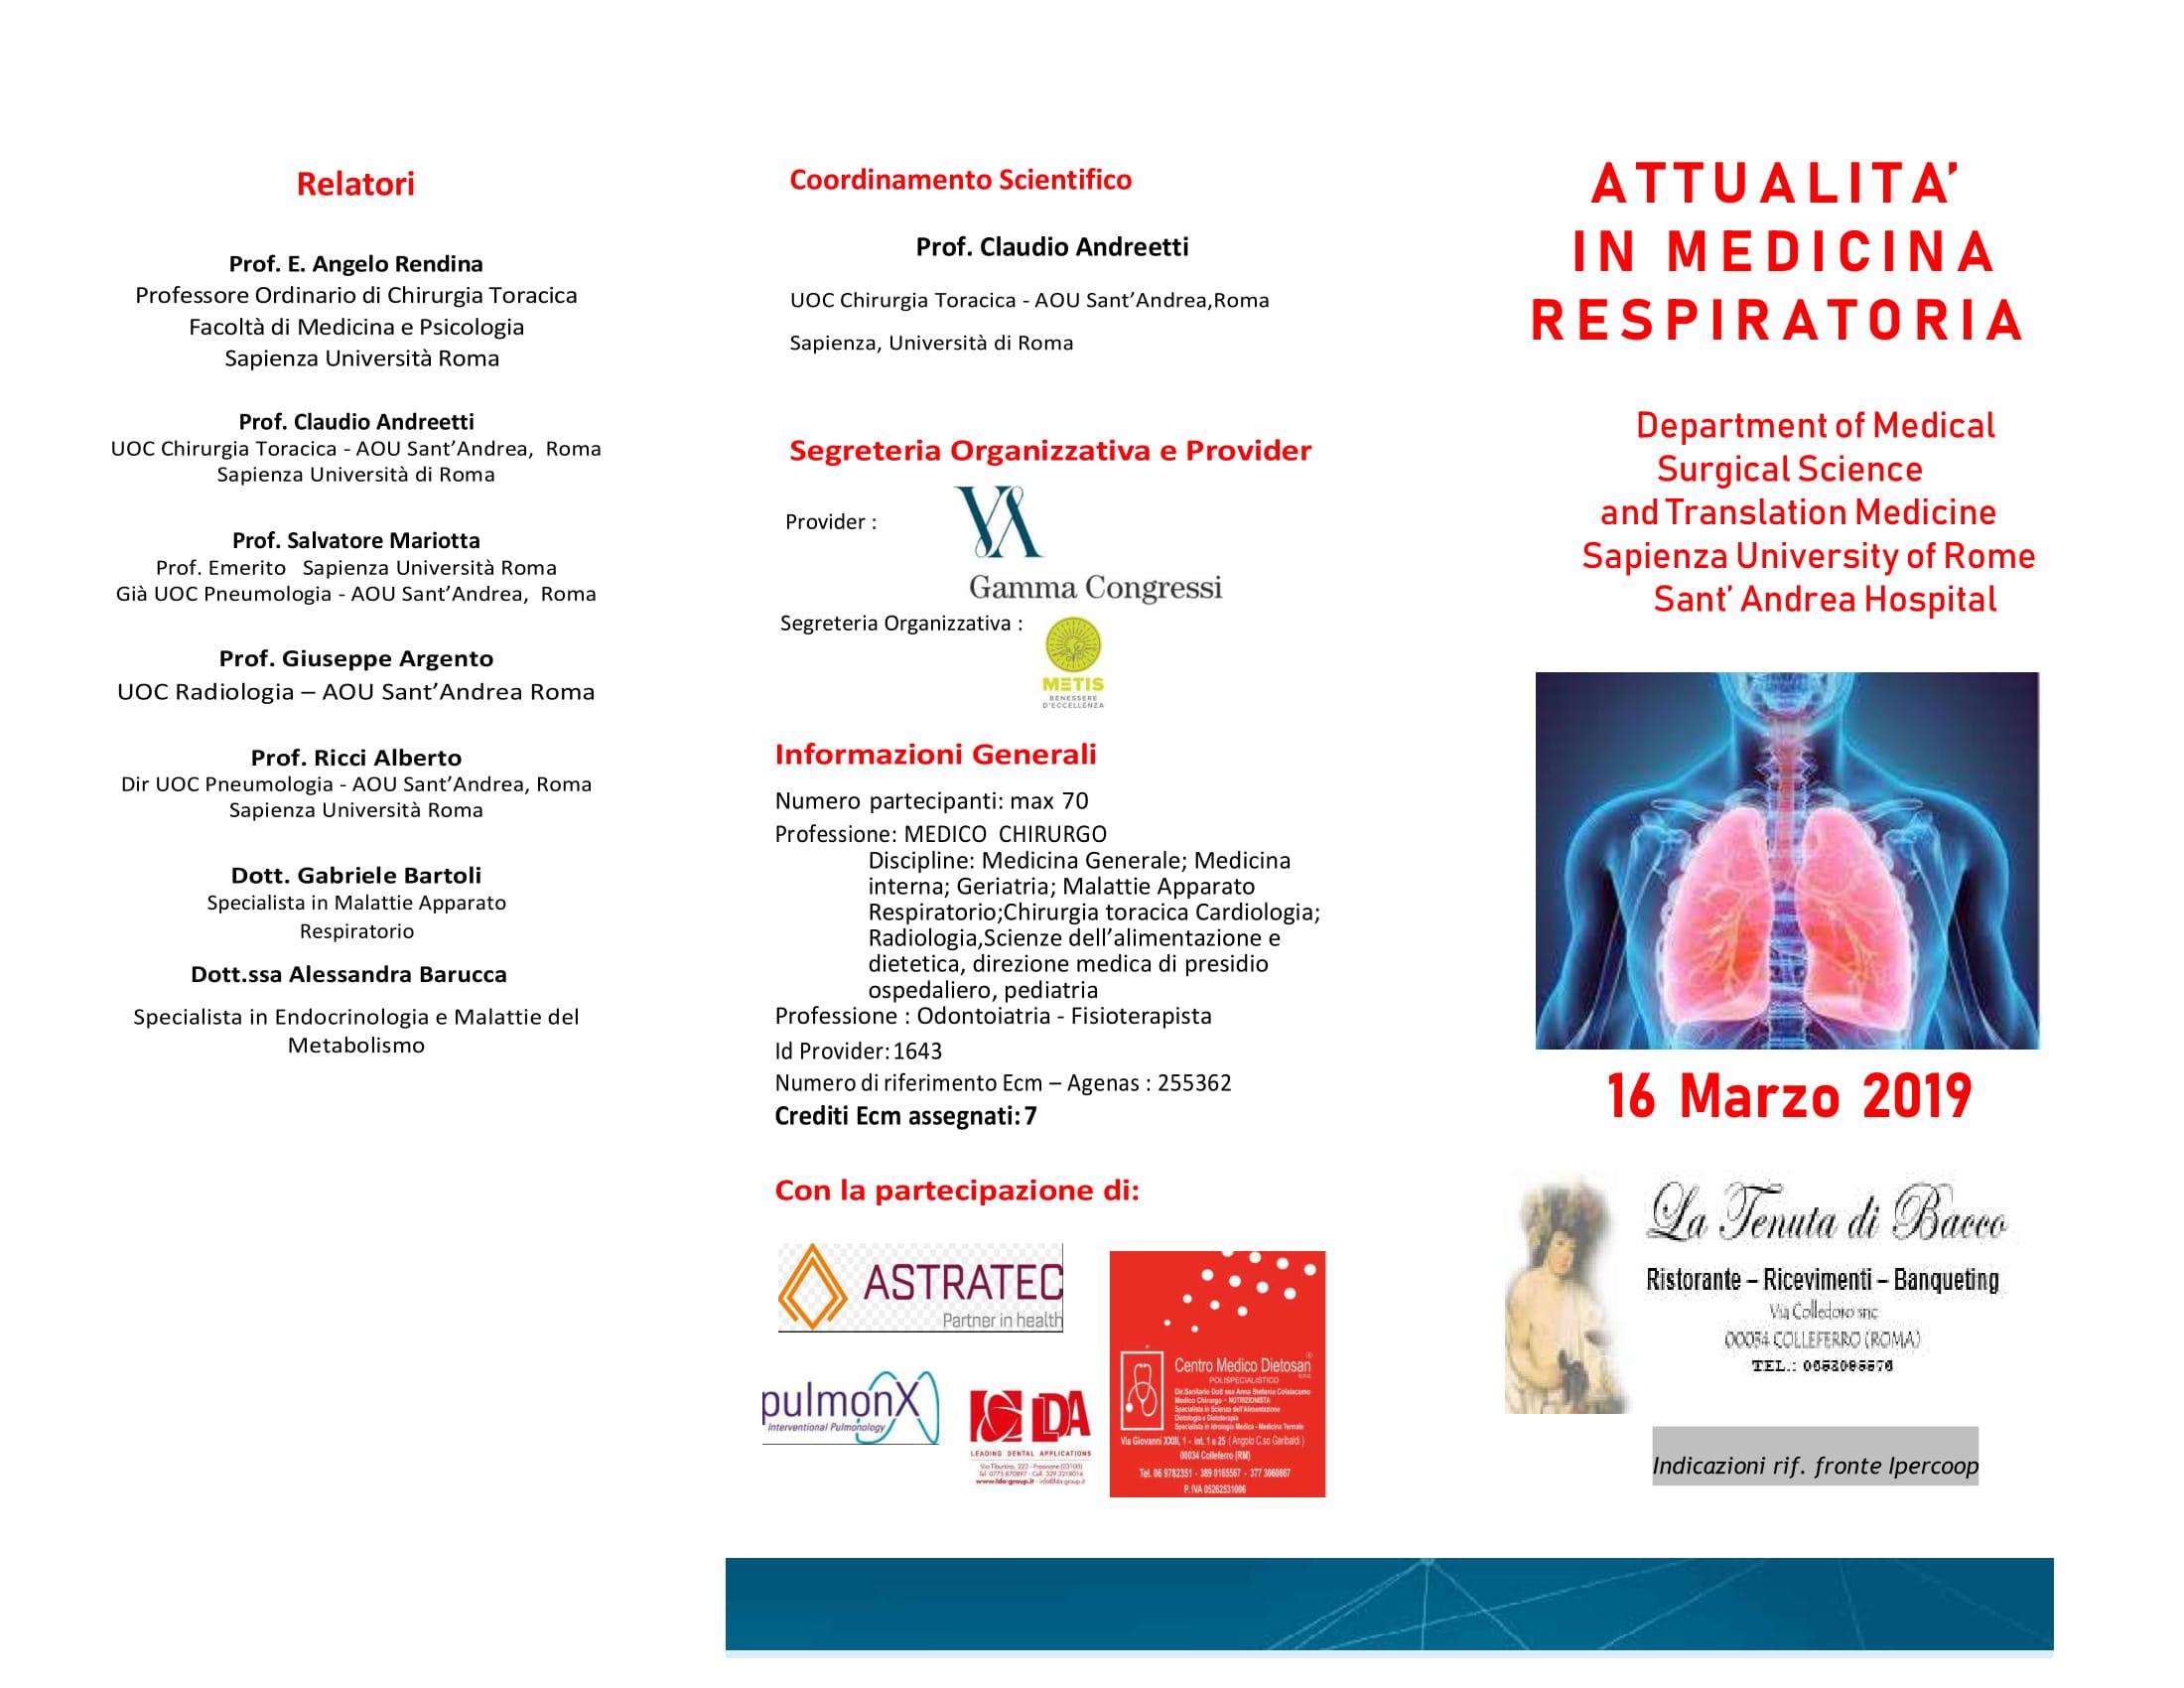 https://www.agenziaeventi.org/immagini_news/15-03-2019/1552679564-24-.jpg